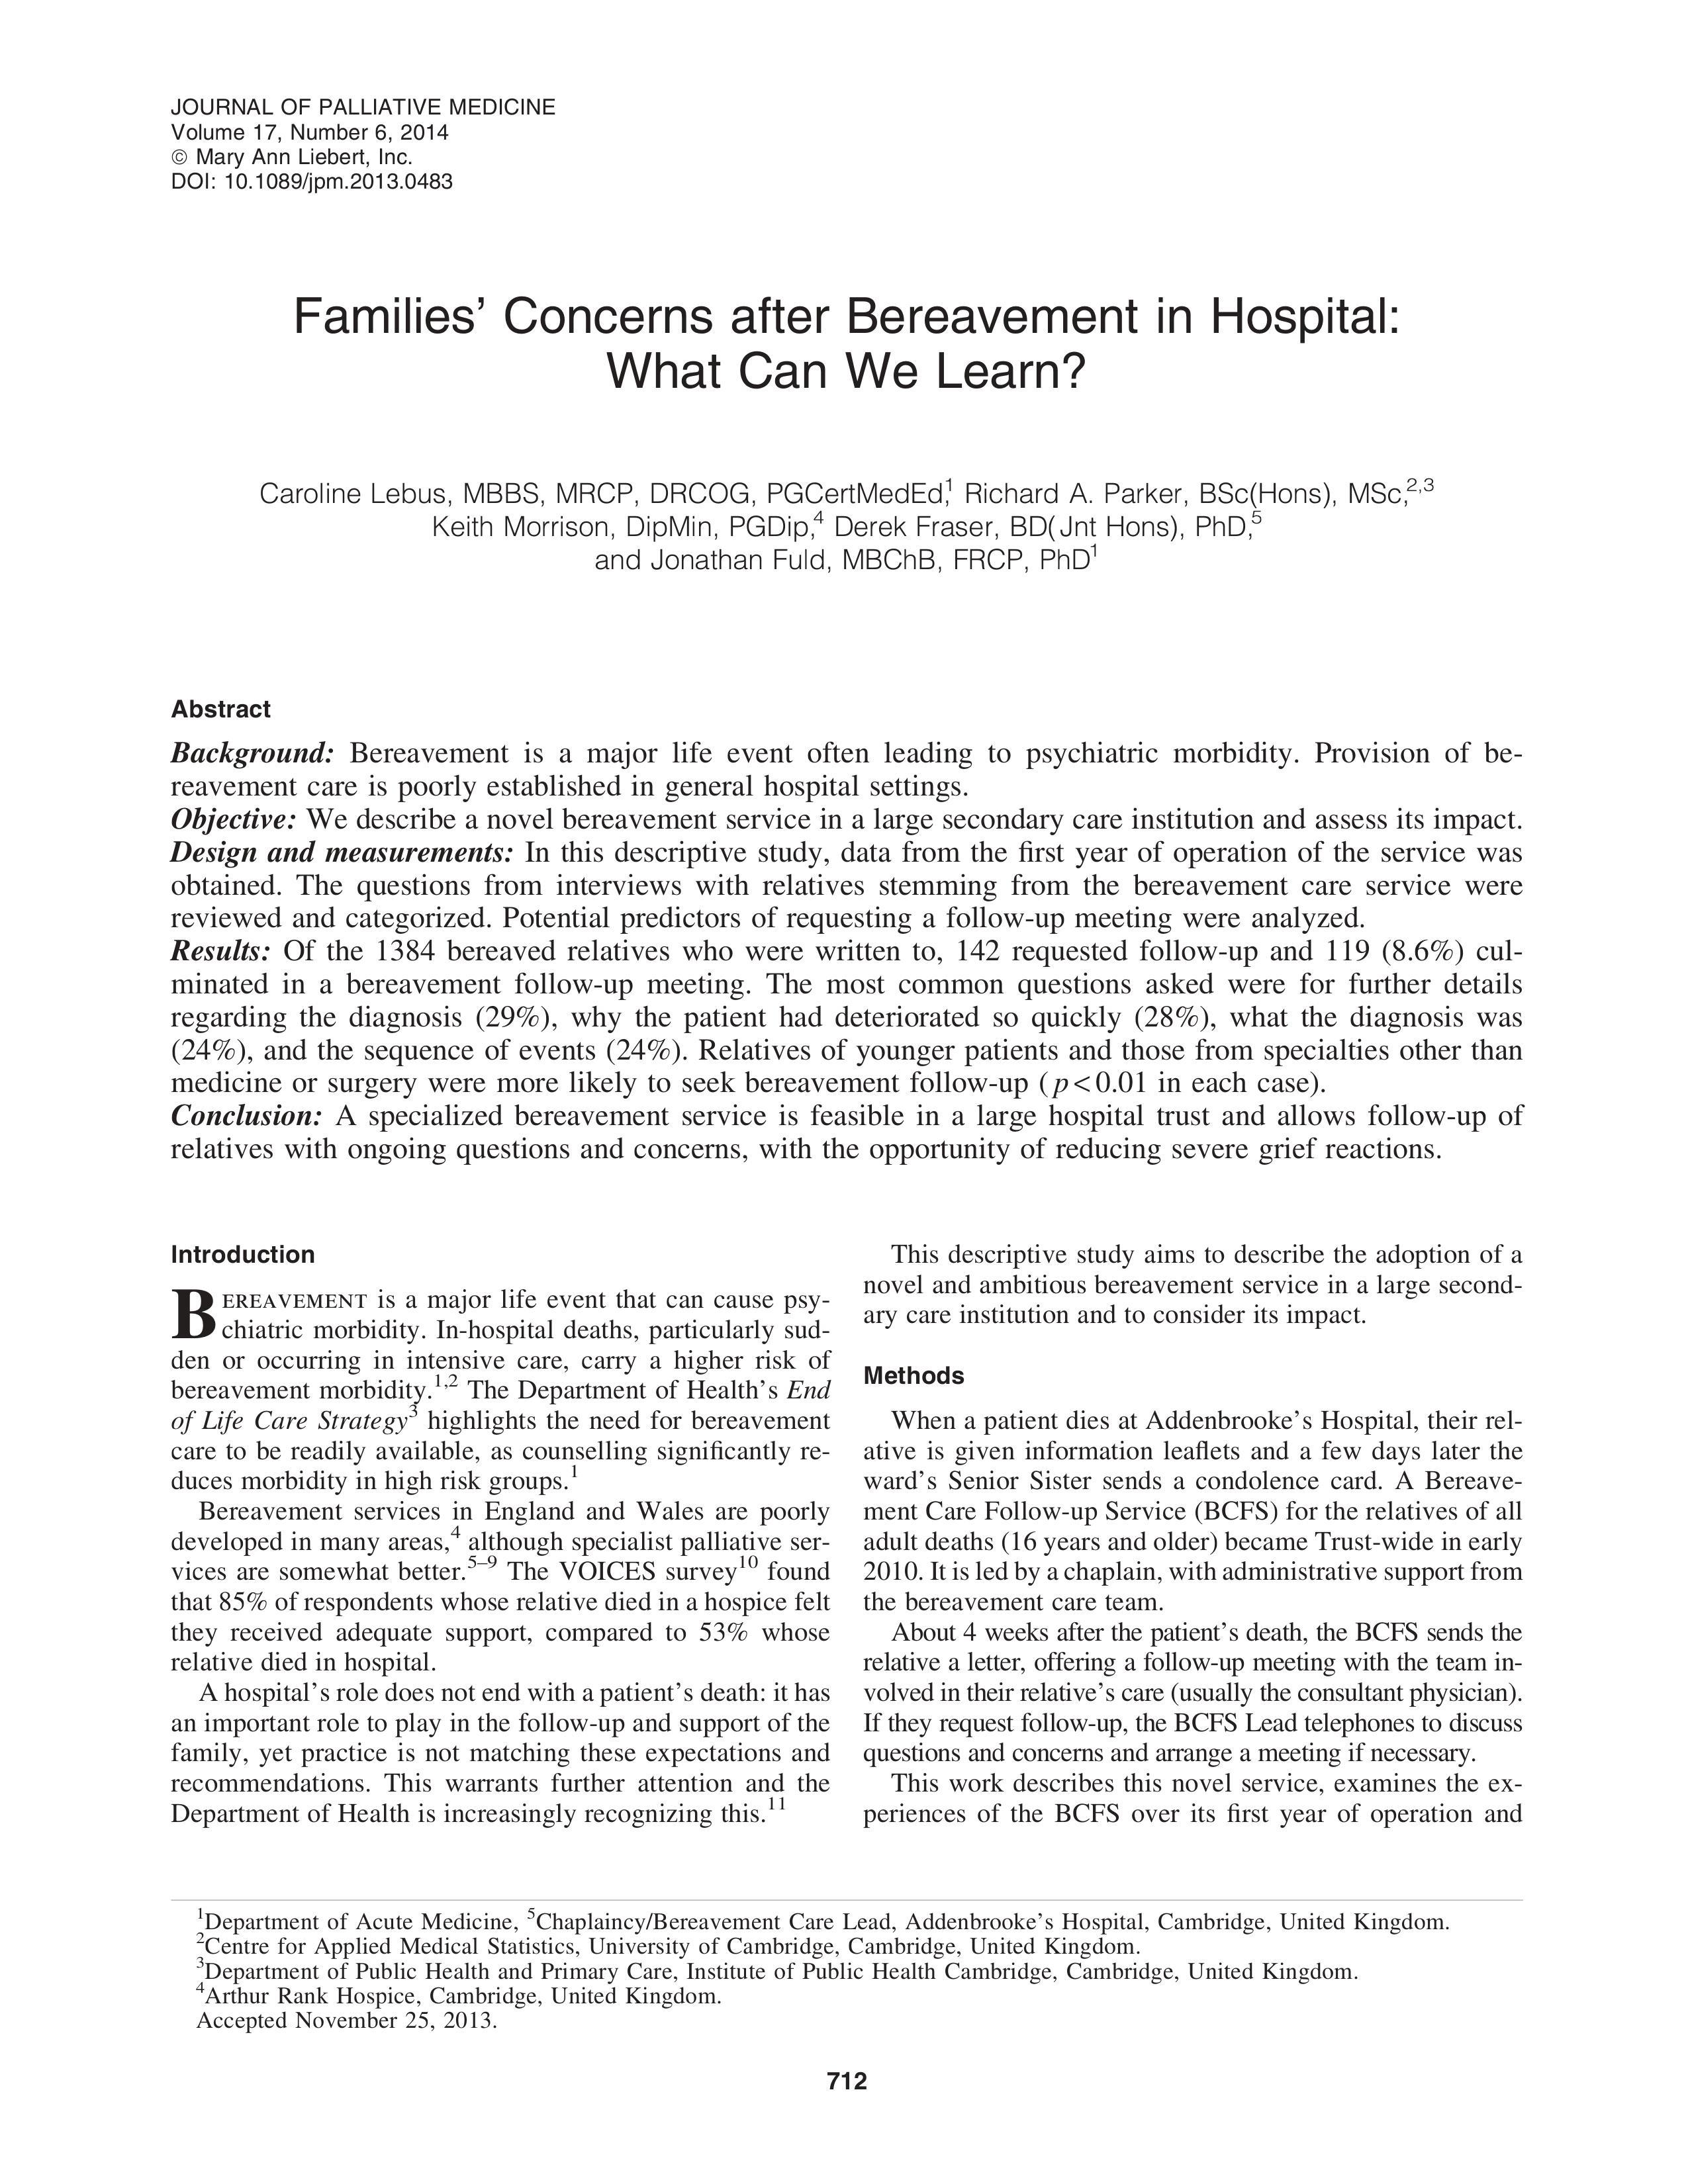 Caroline Lebus, Richard A. Parker, Keith Morrison, Derek Fraser, Jonathan Fuld. Journal of Palliative Care, 2014 (17):712-7. DOI: 10.1089/jpm.2013.0483